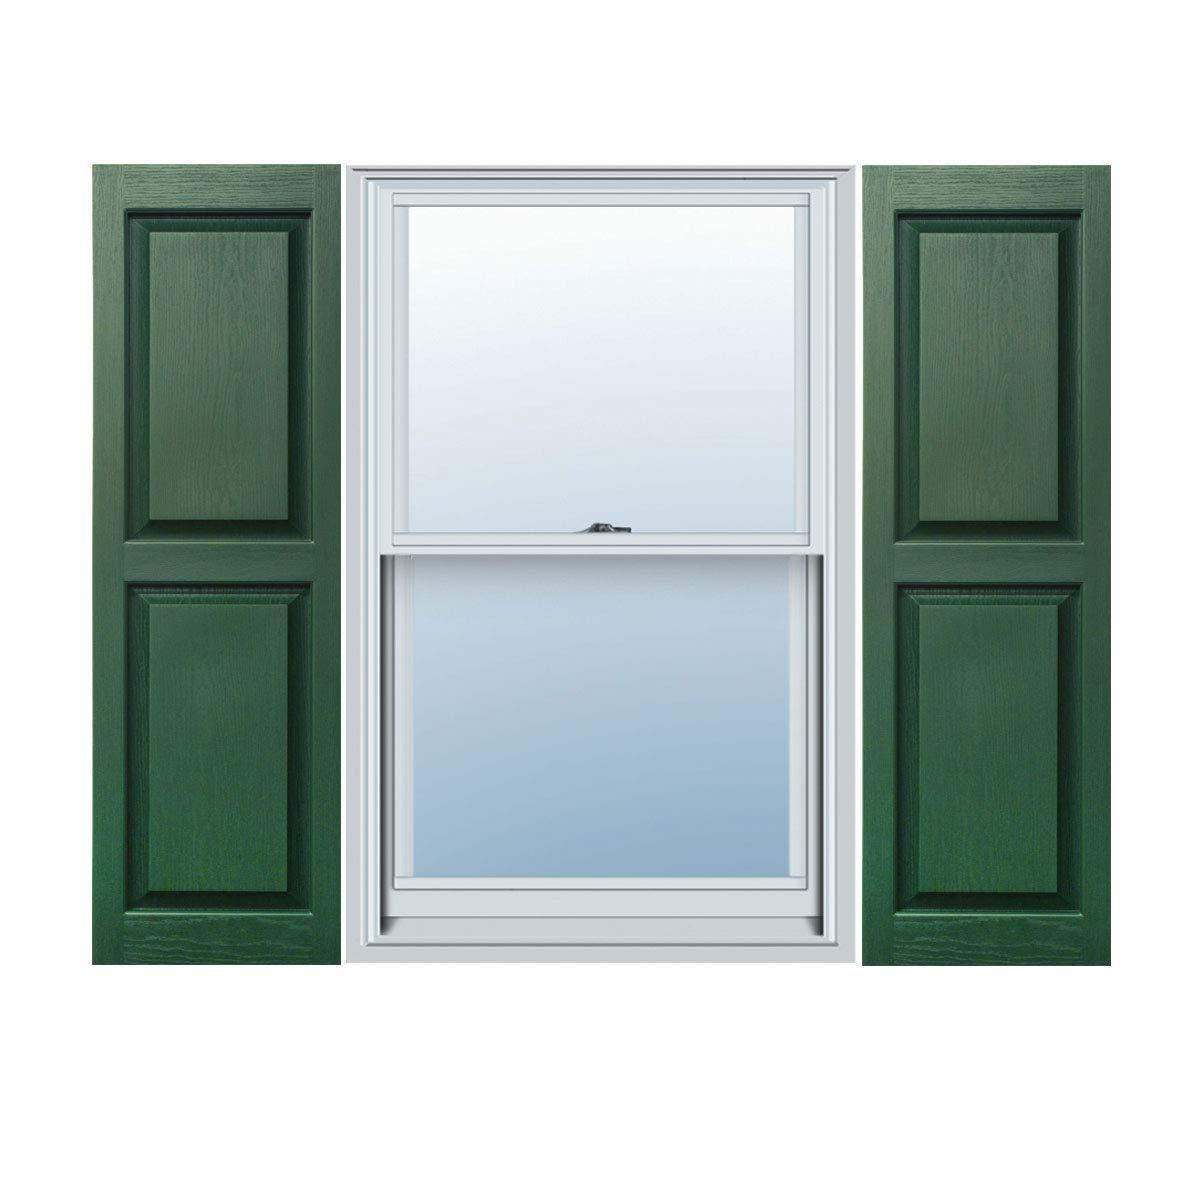 12 x 35 Builders Choice Vinyl Raised Panel Window Shutters Forest Green Per Pair w//Shutter Spikes /& Screws